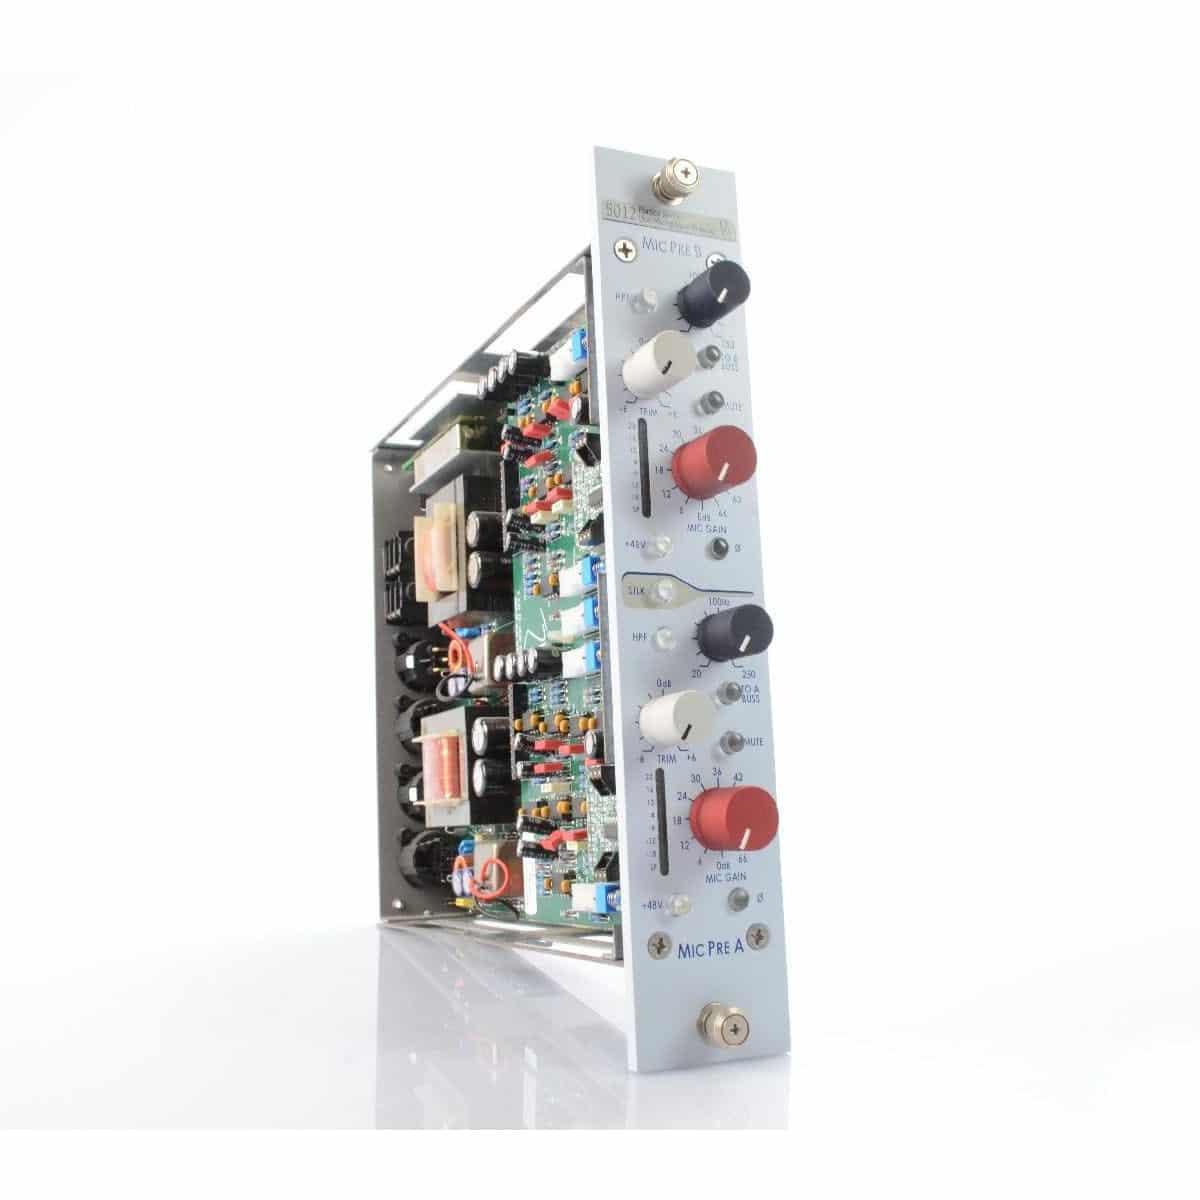 Rupert Neve 5012 V 02 Pro Audio, Outboard, Preamplificatori Microfonici